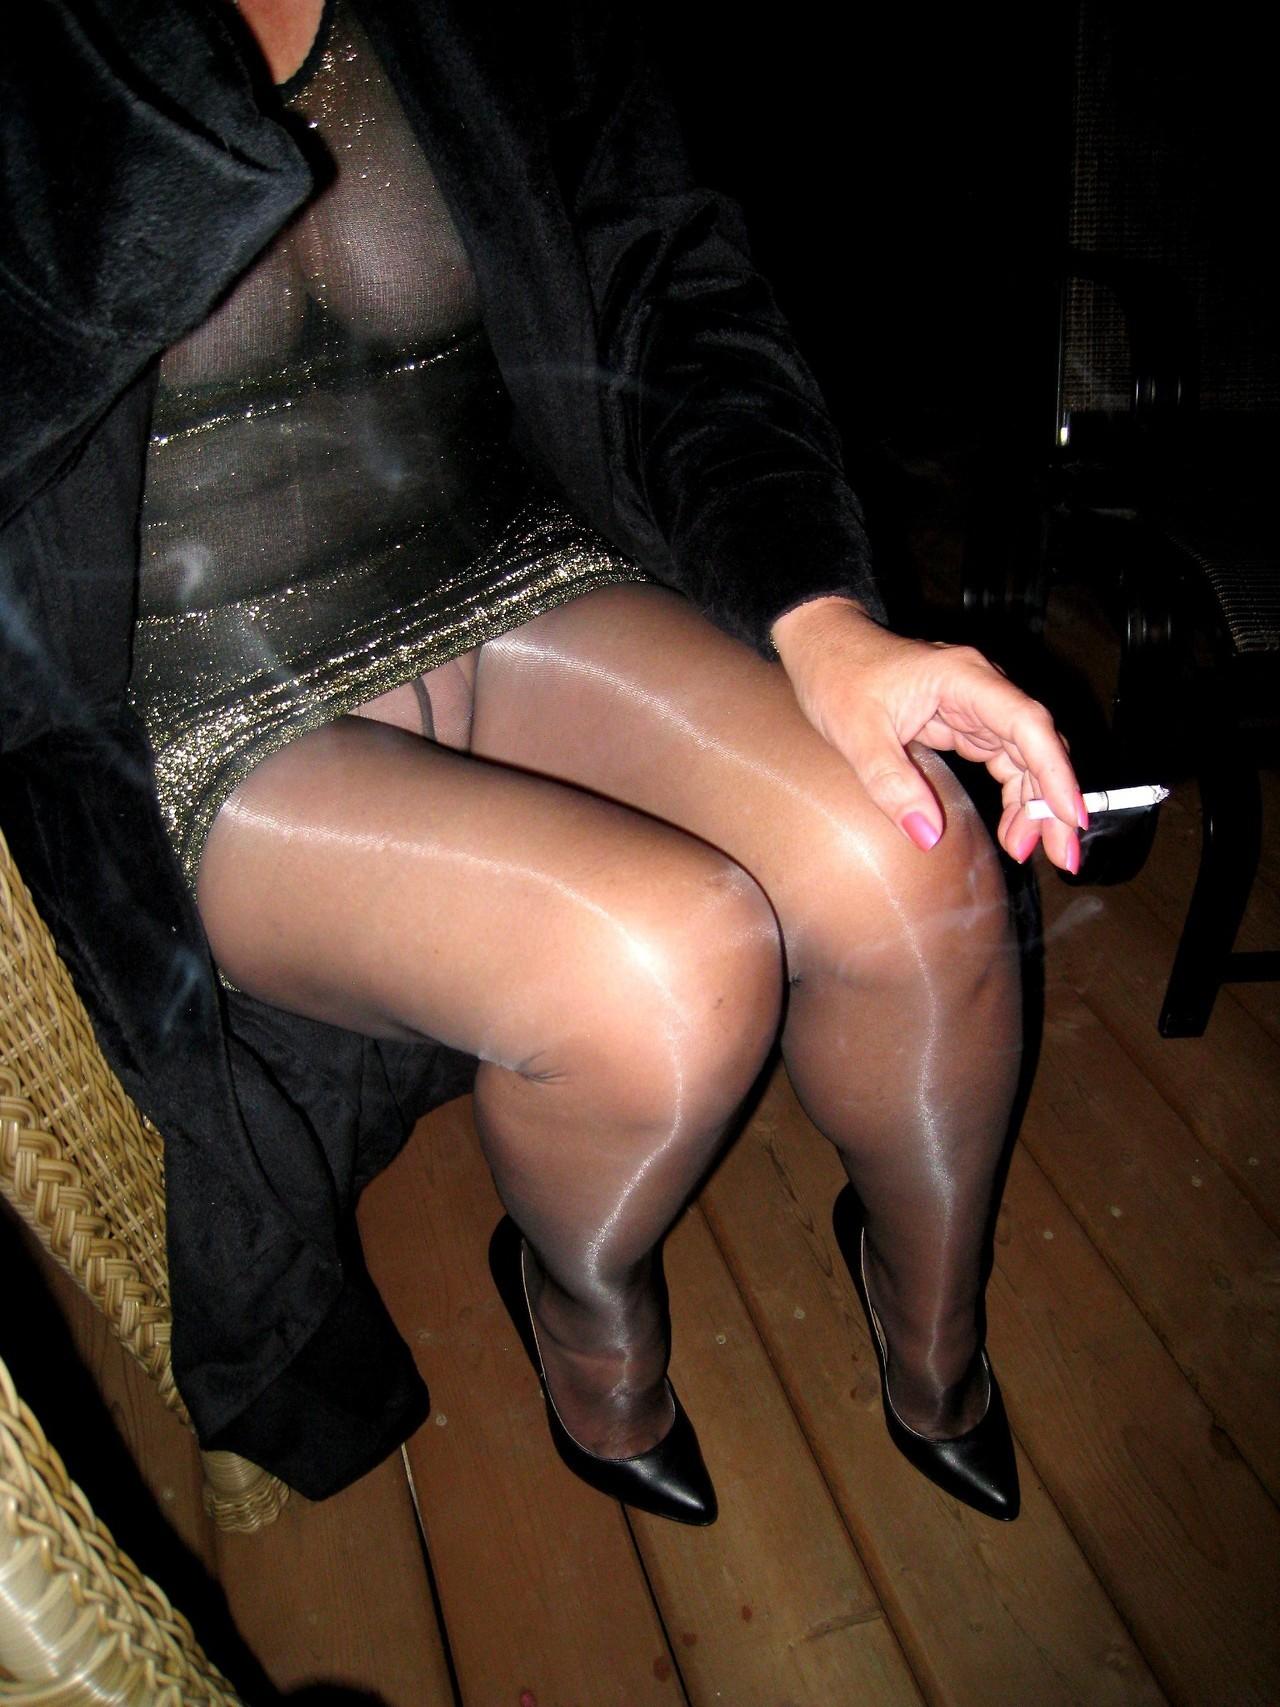 pantyhose sex shiny Glossy